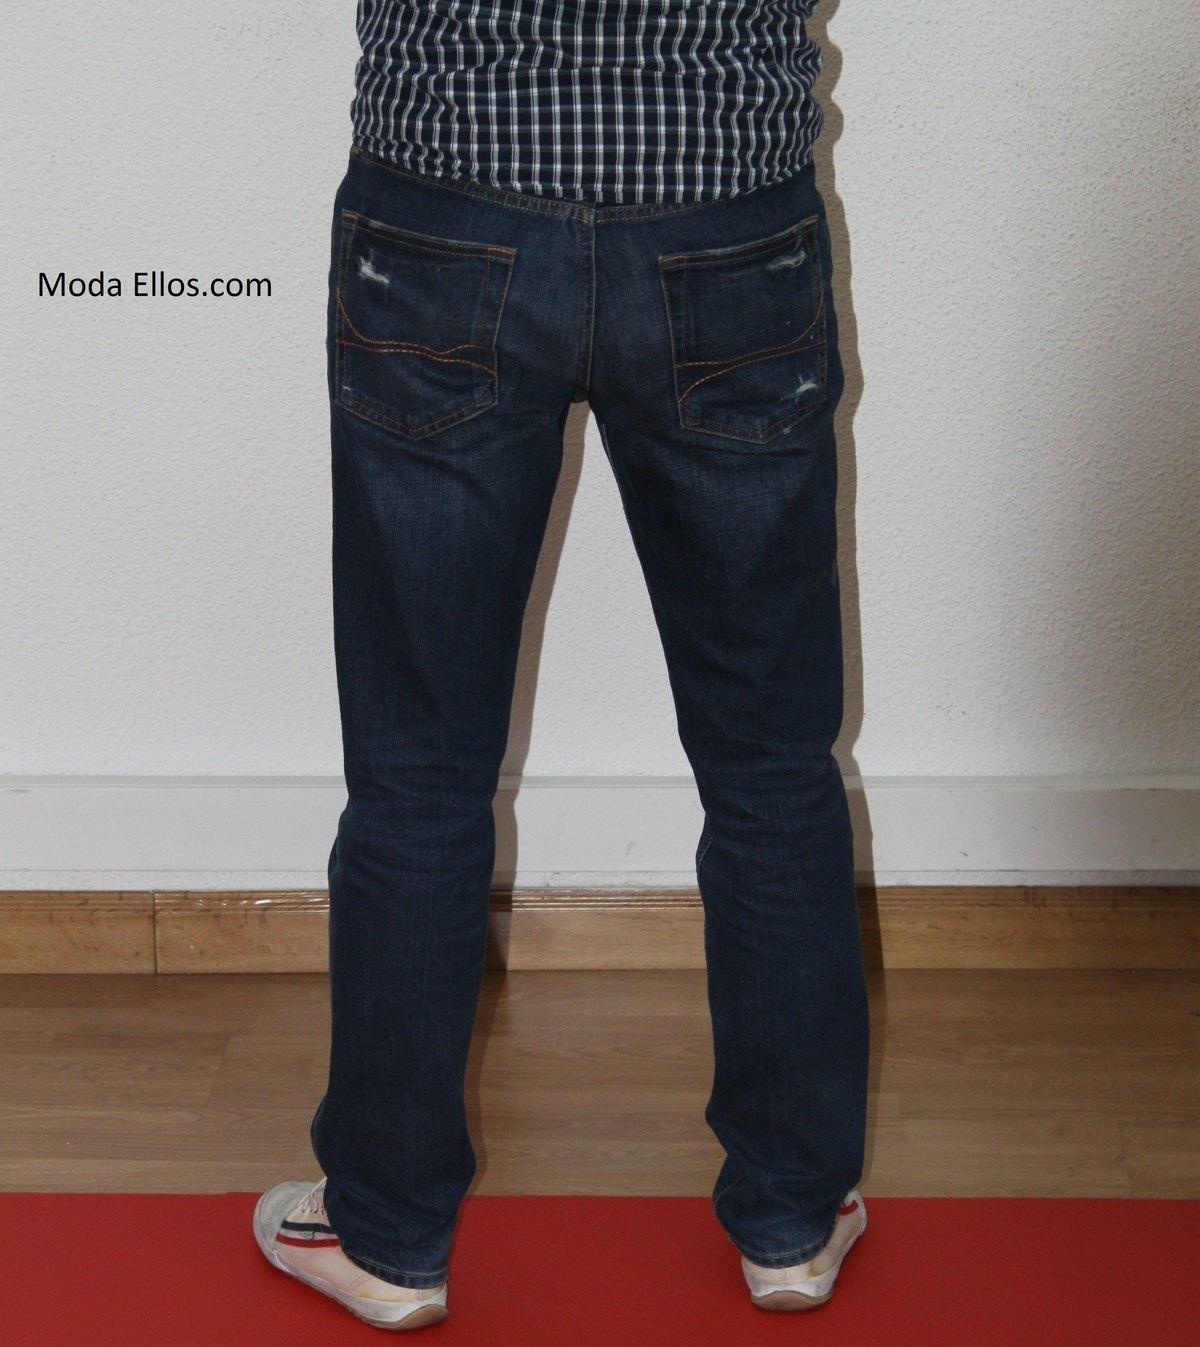 pantalones-holliser-2013-parte-trasera